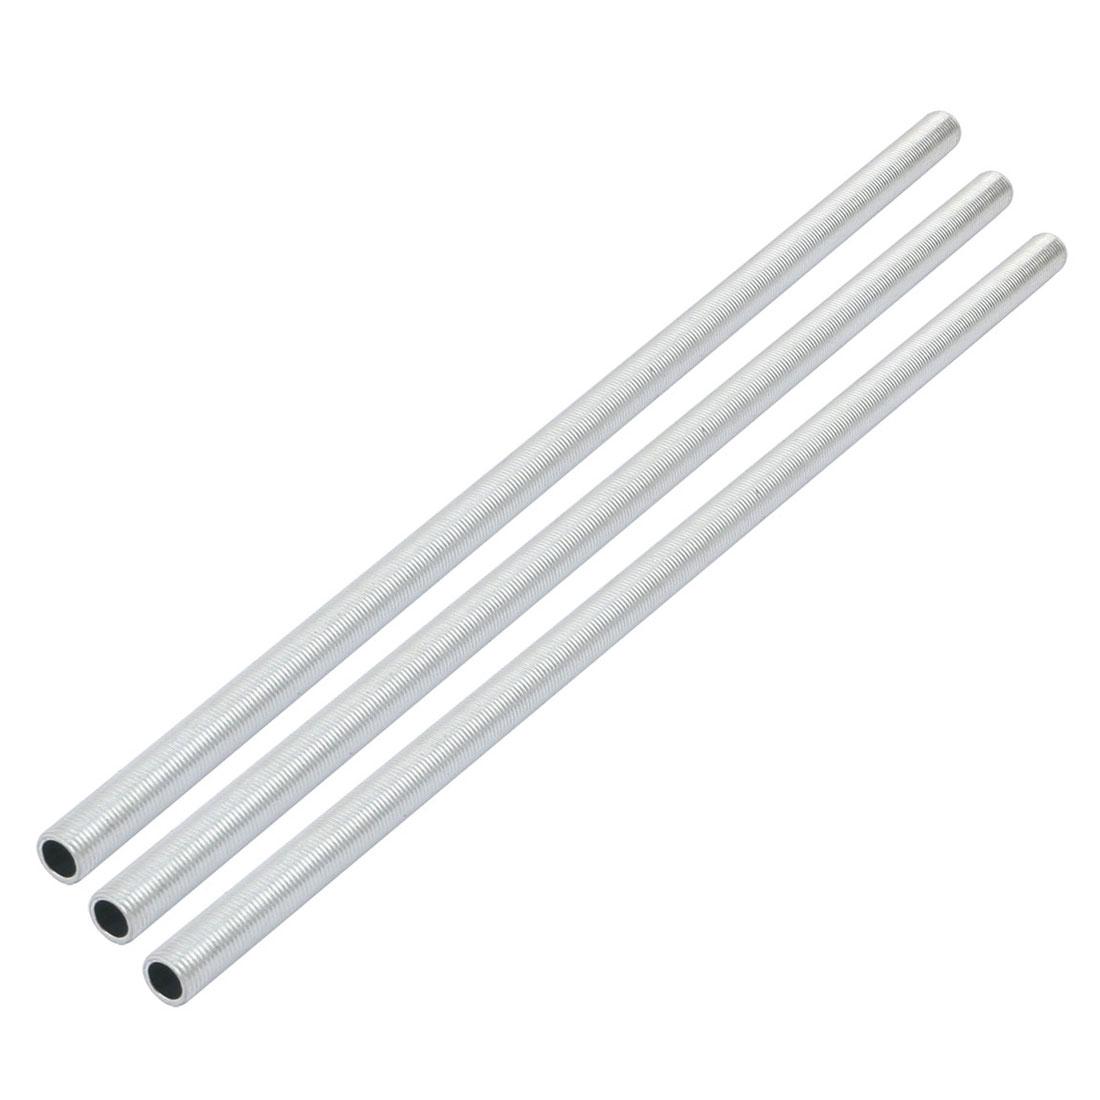 Metric M10 1mm Pitch Thread Zinc Plated Pipe Nipple Lamp Parts 310mm Long 3pcs